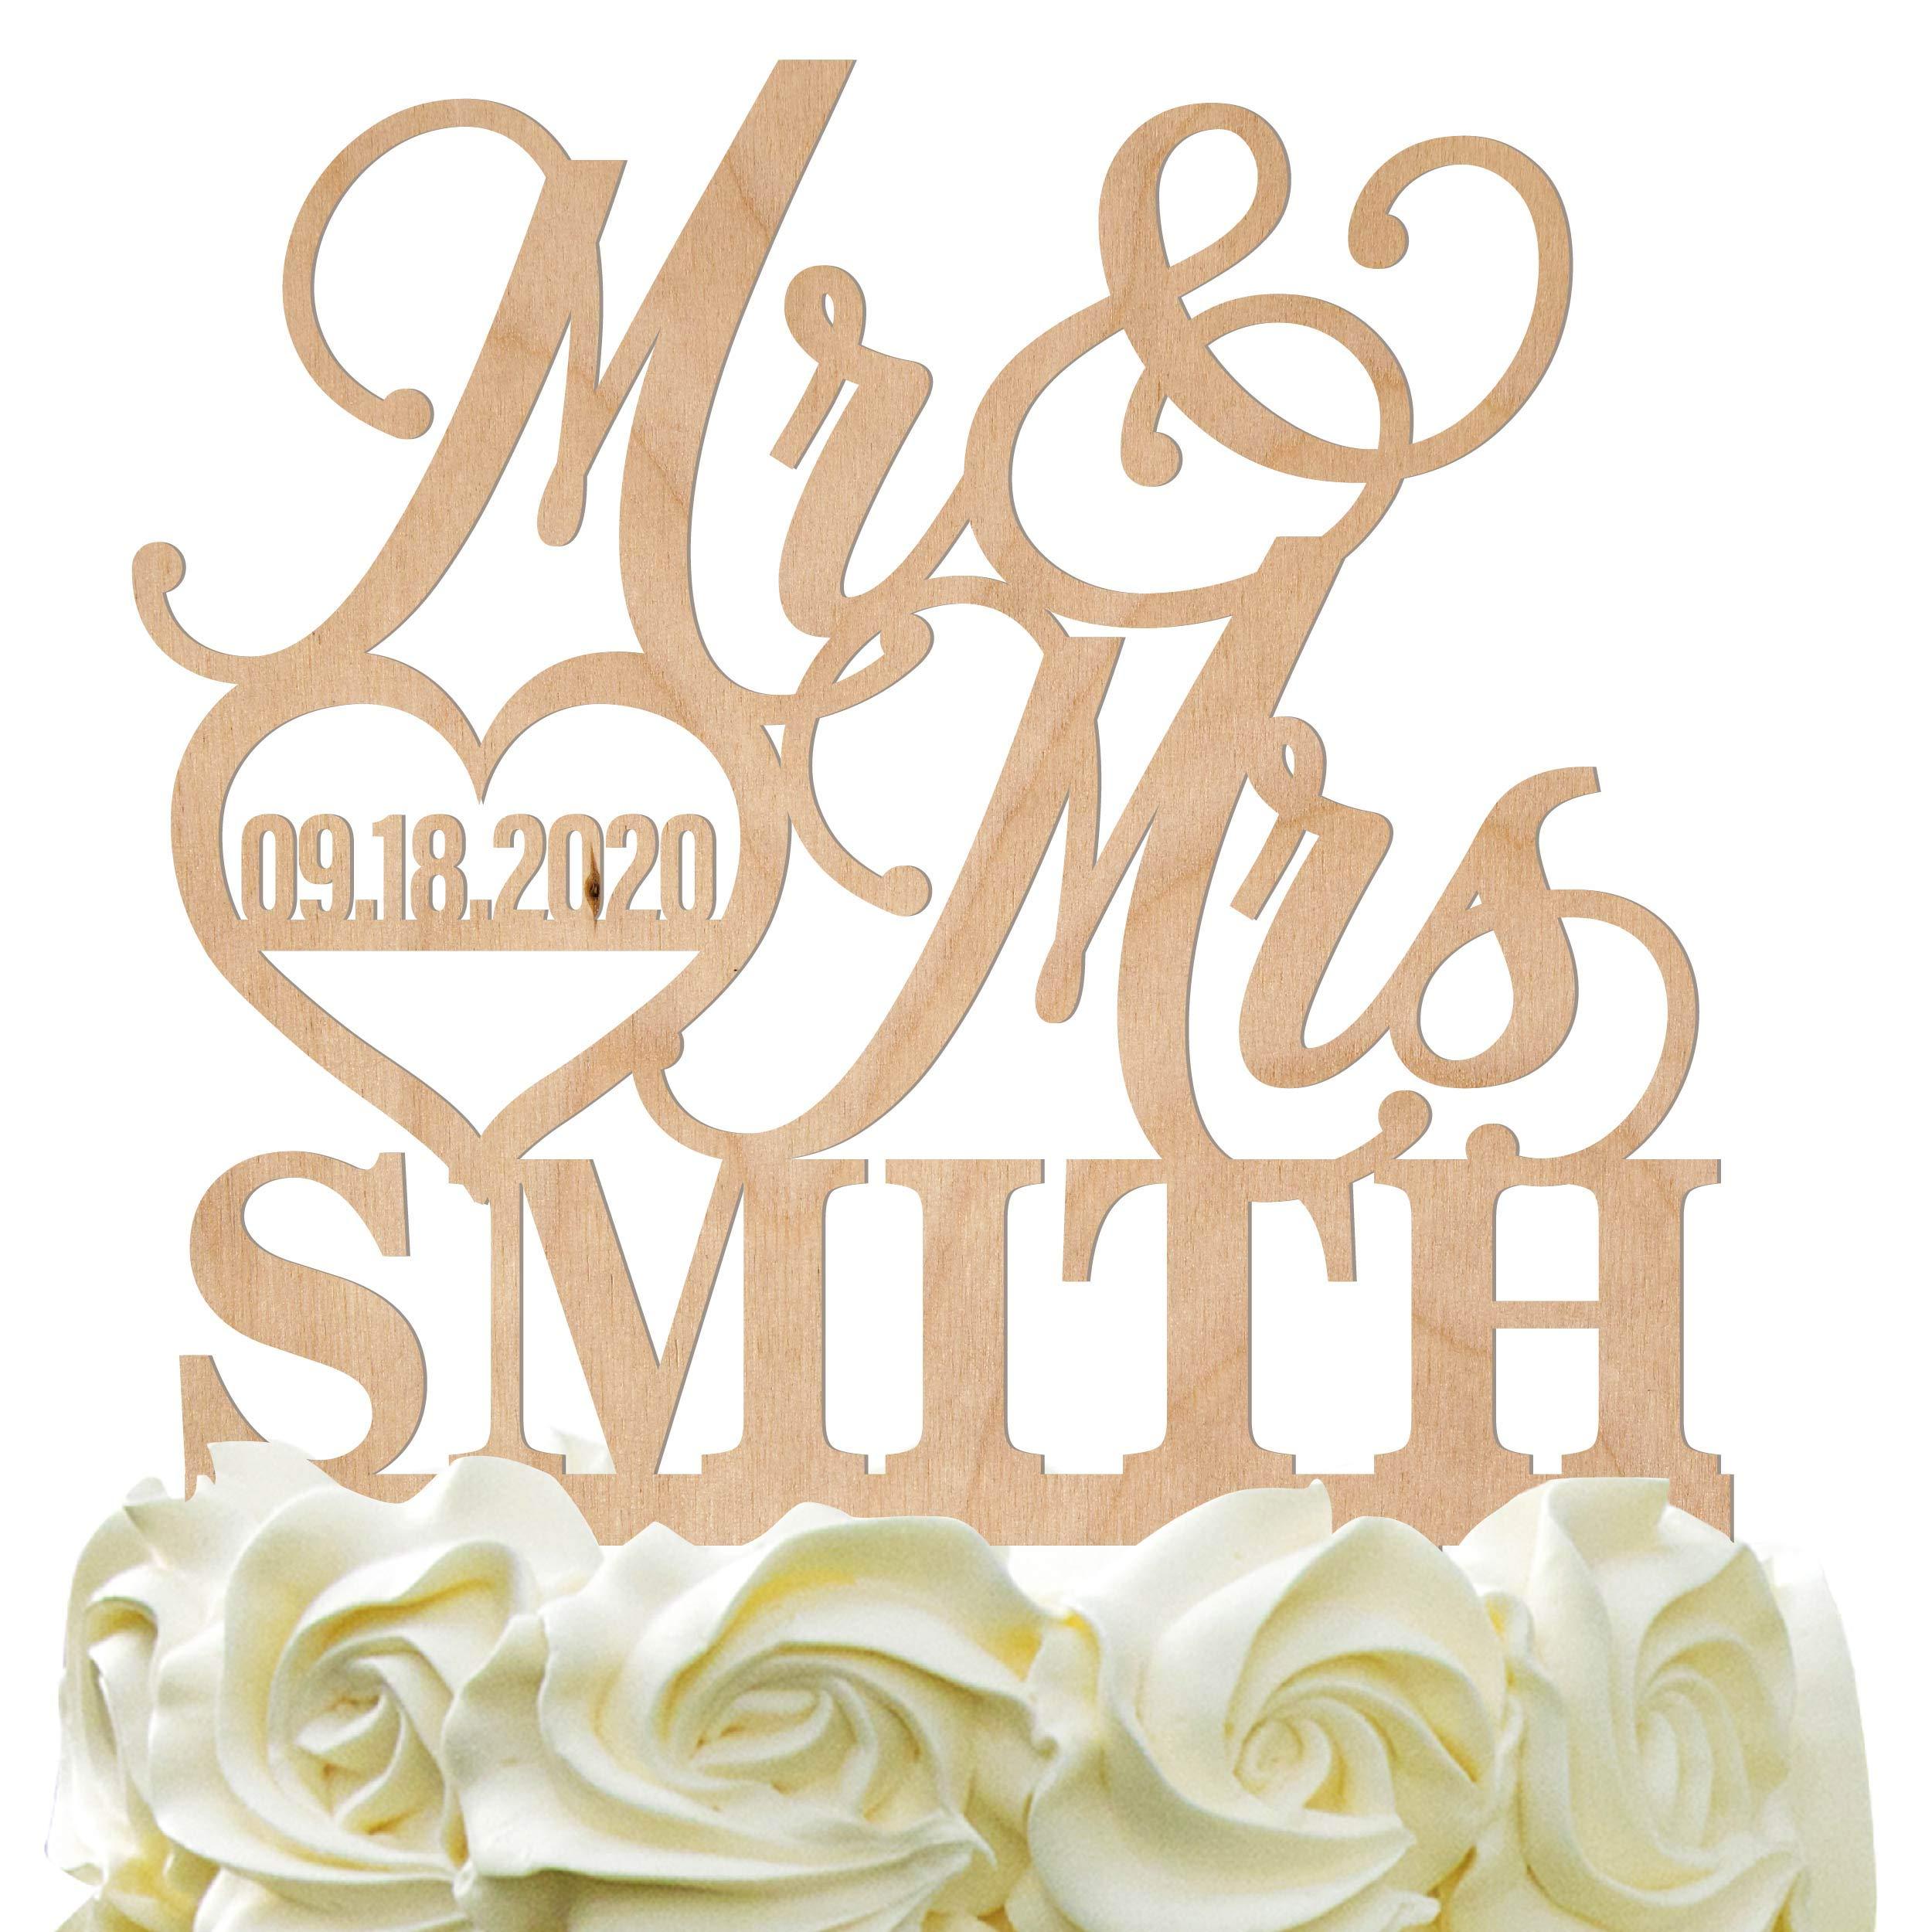 Personalized Wedding Cake Topper - Wedding Cake Decoration Elegant Customized Mr-Mrs, Last Name & Date With HeartWood